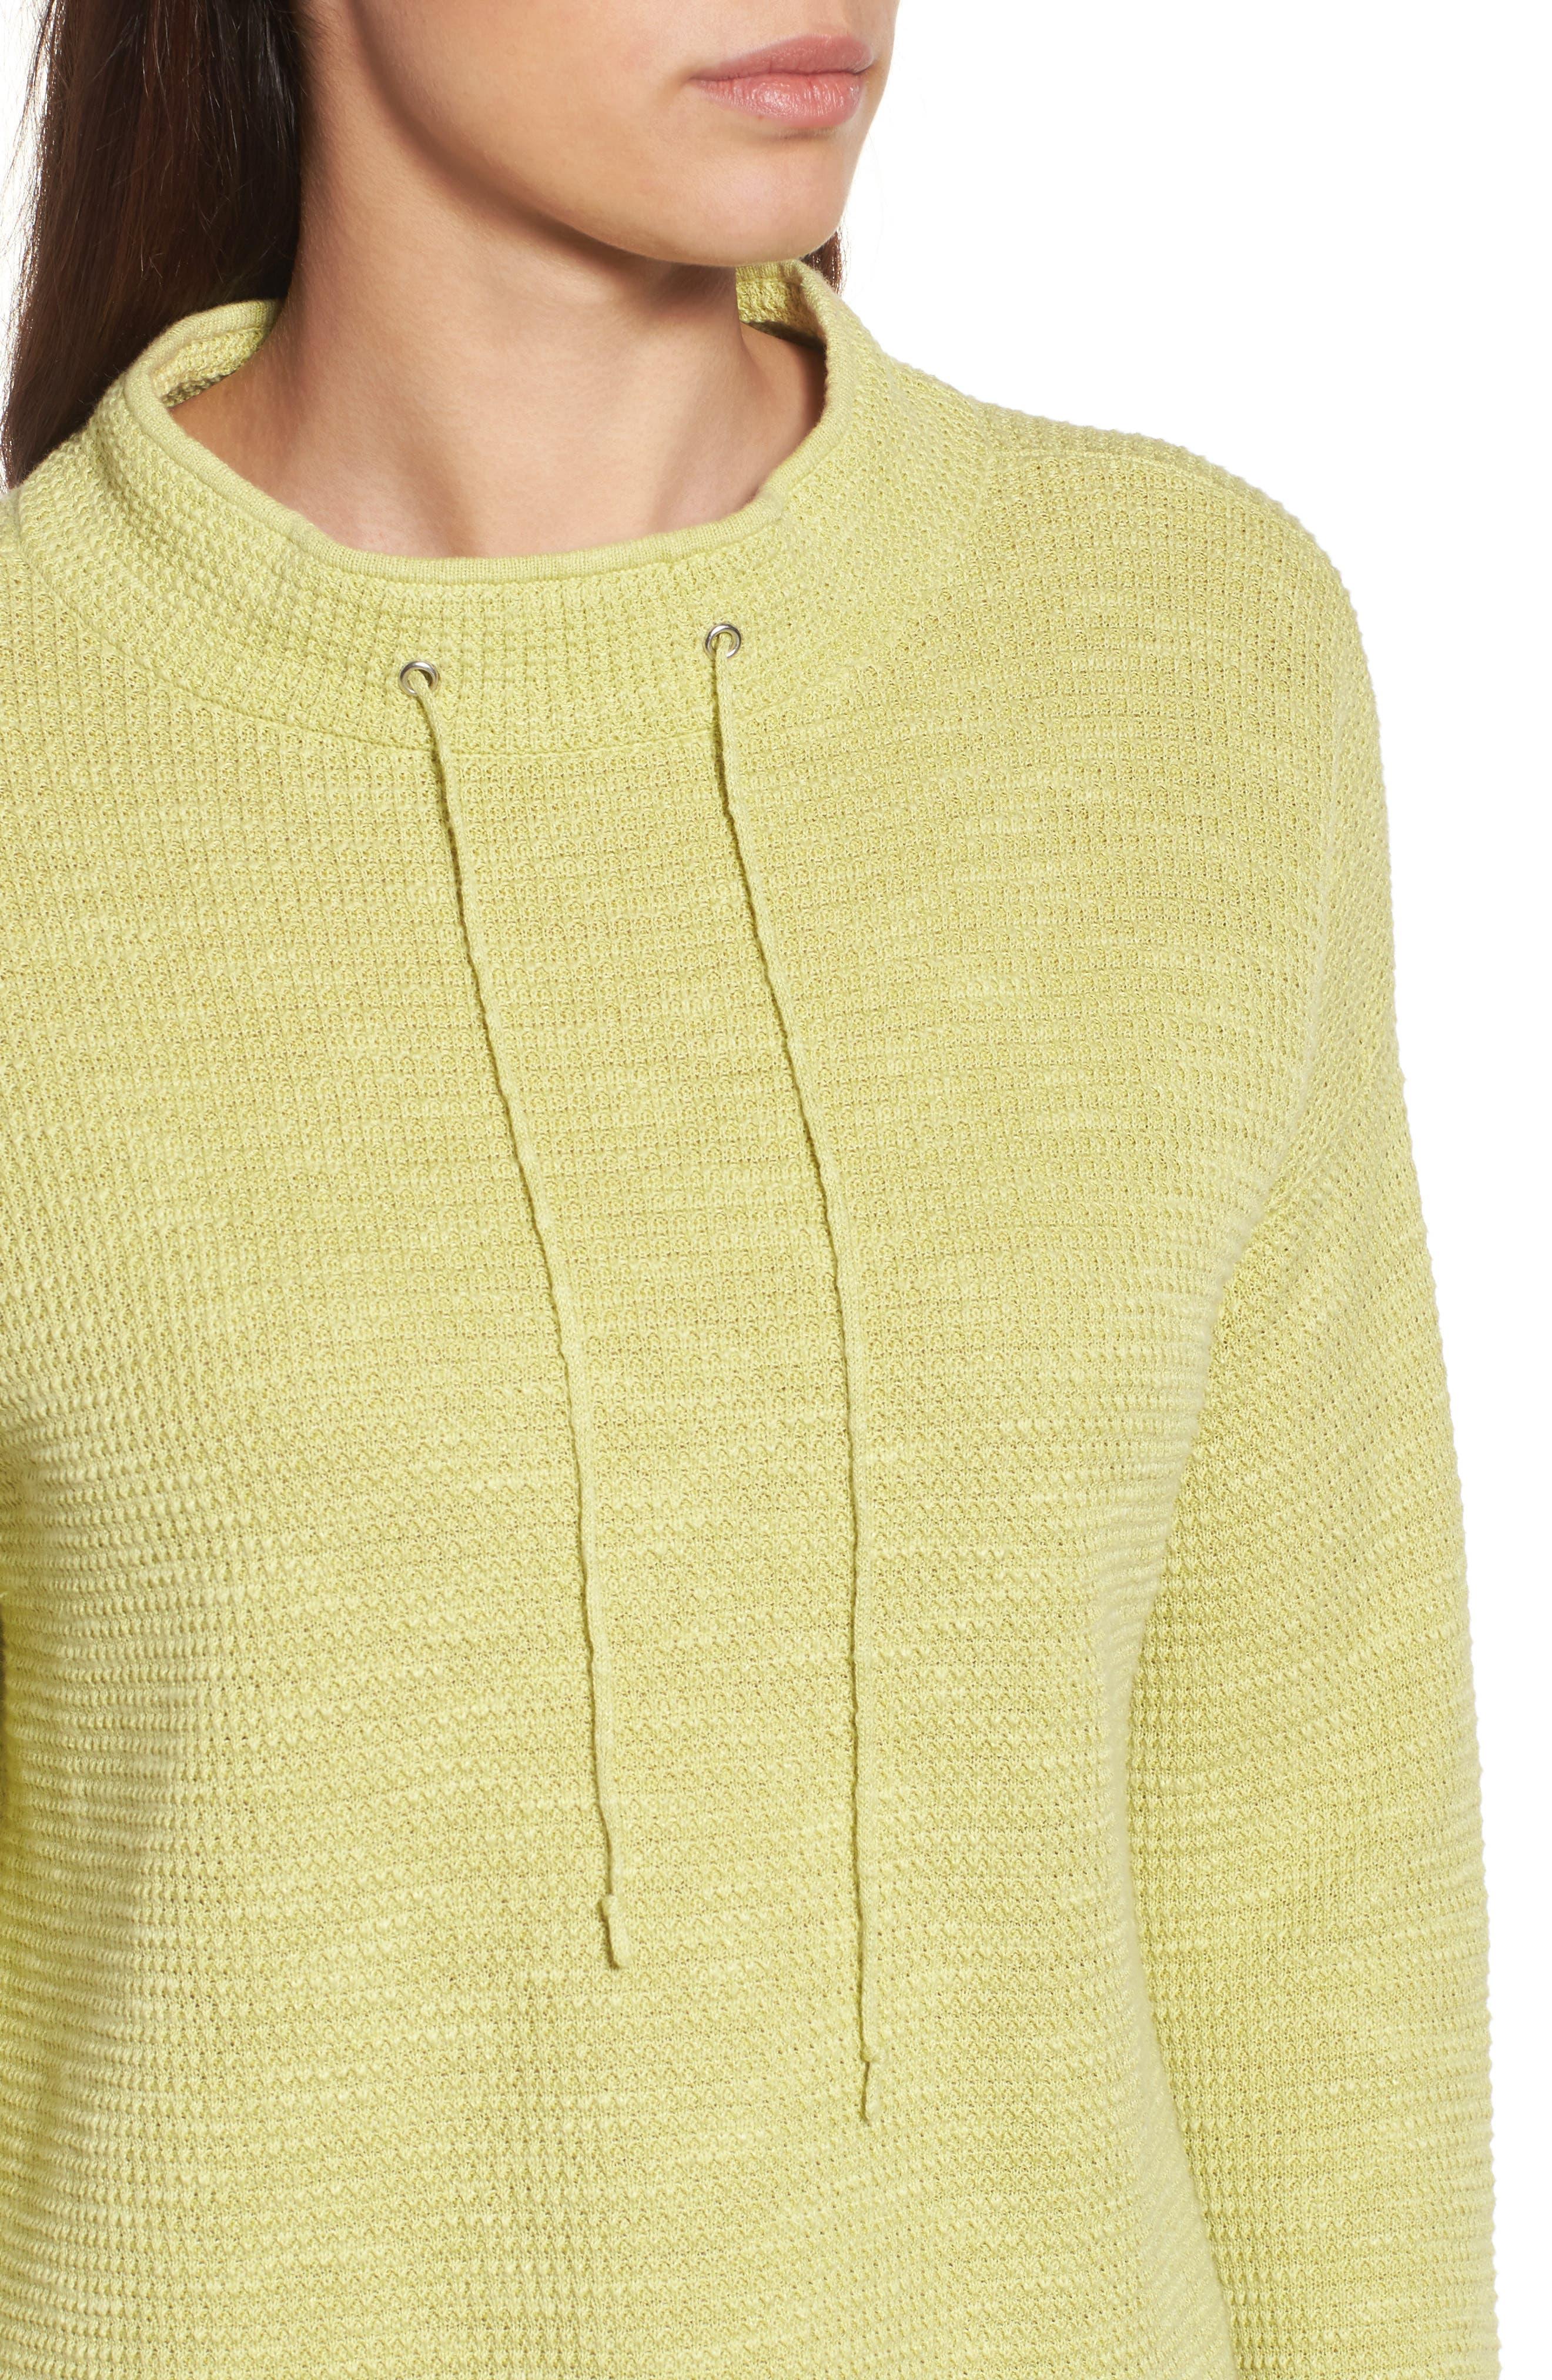 Drawstring Neck Organic Linen & Cotton Top,                             Alternate thumbnail 11, color,